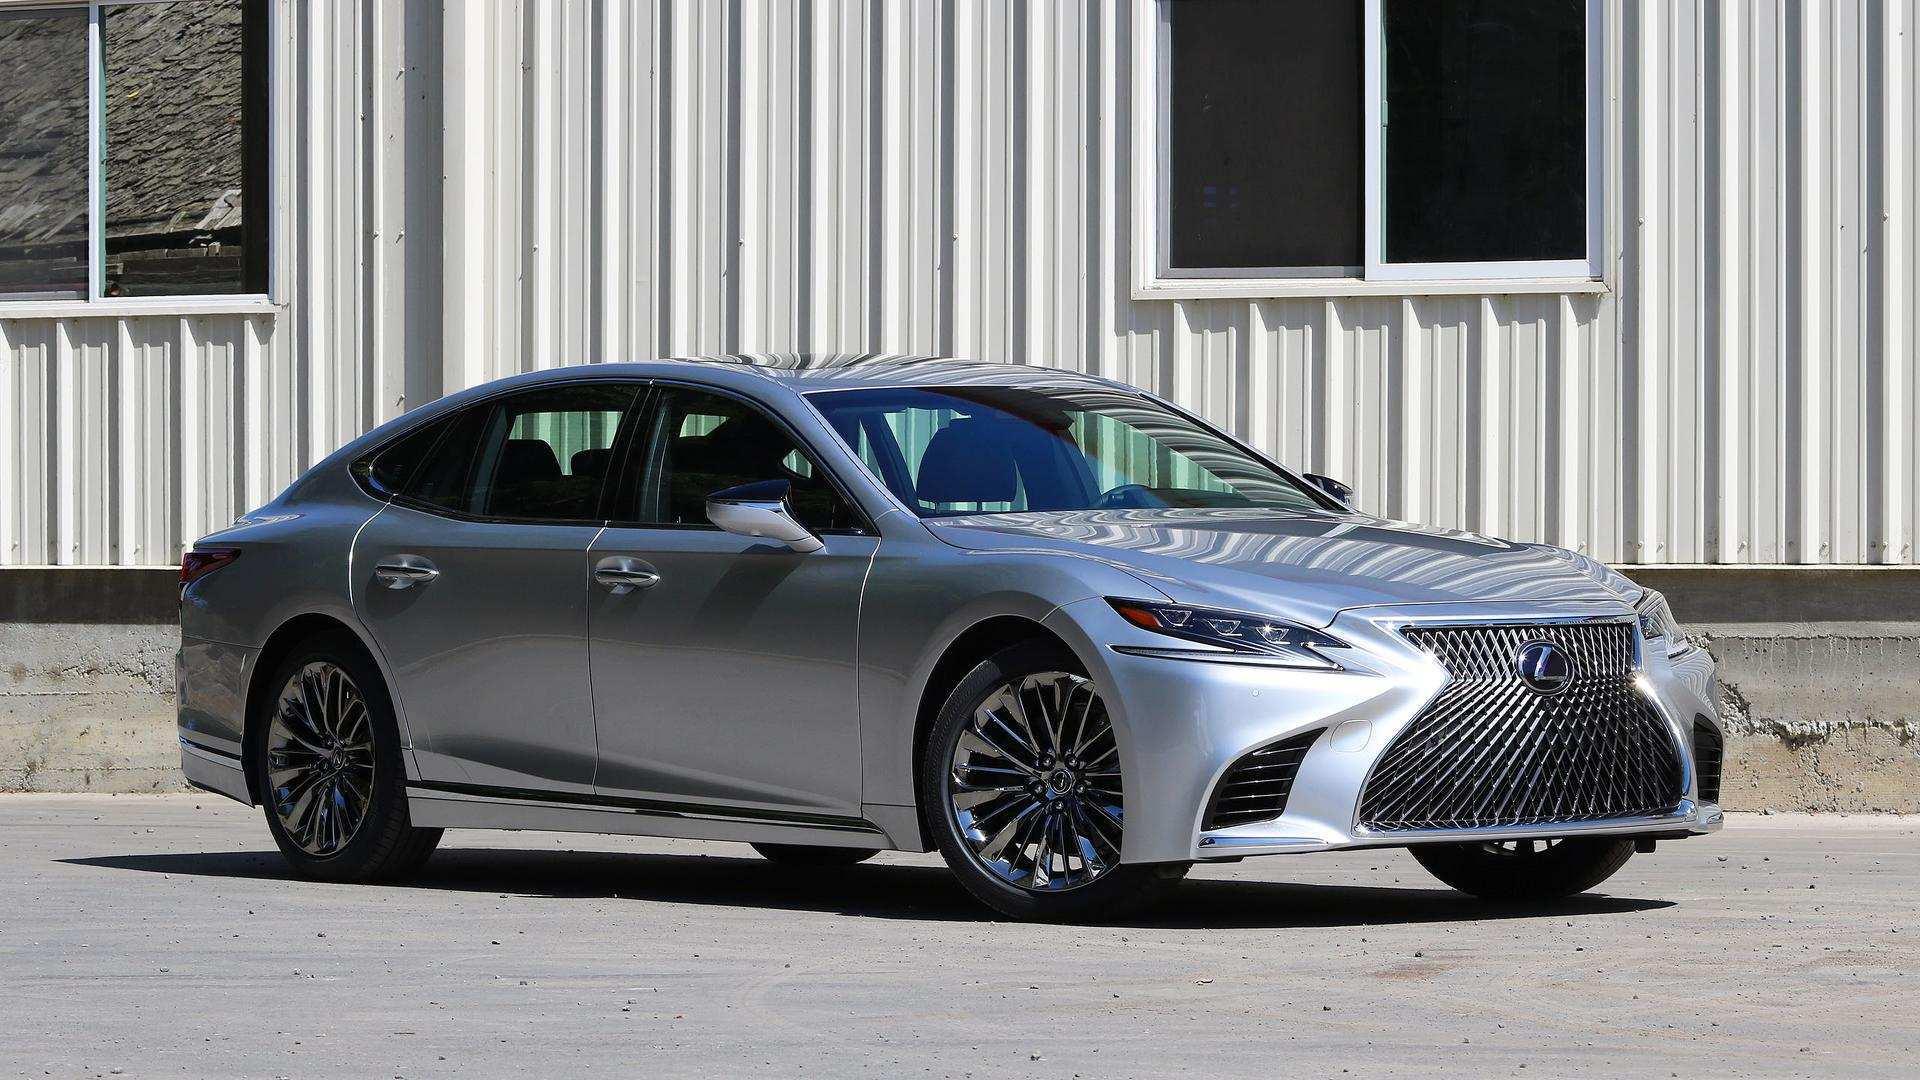 20 Great 2020 Lexus LSs Speed Test with 2020 Lexus LSs